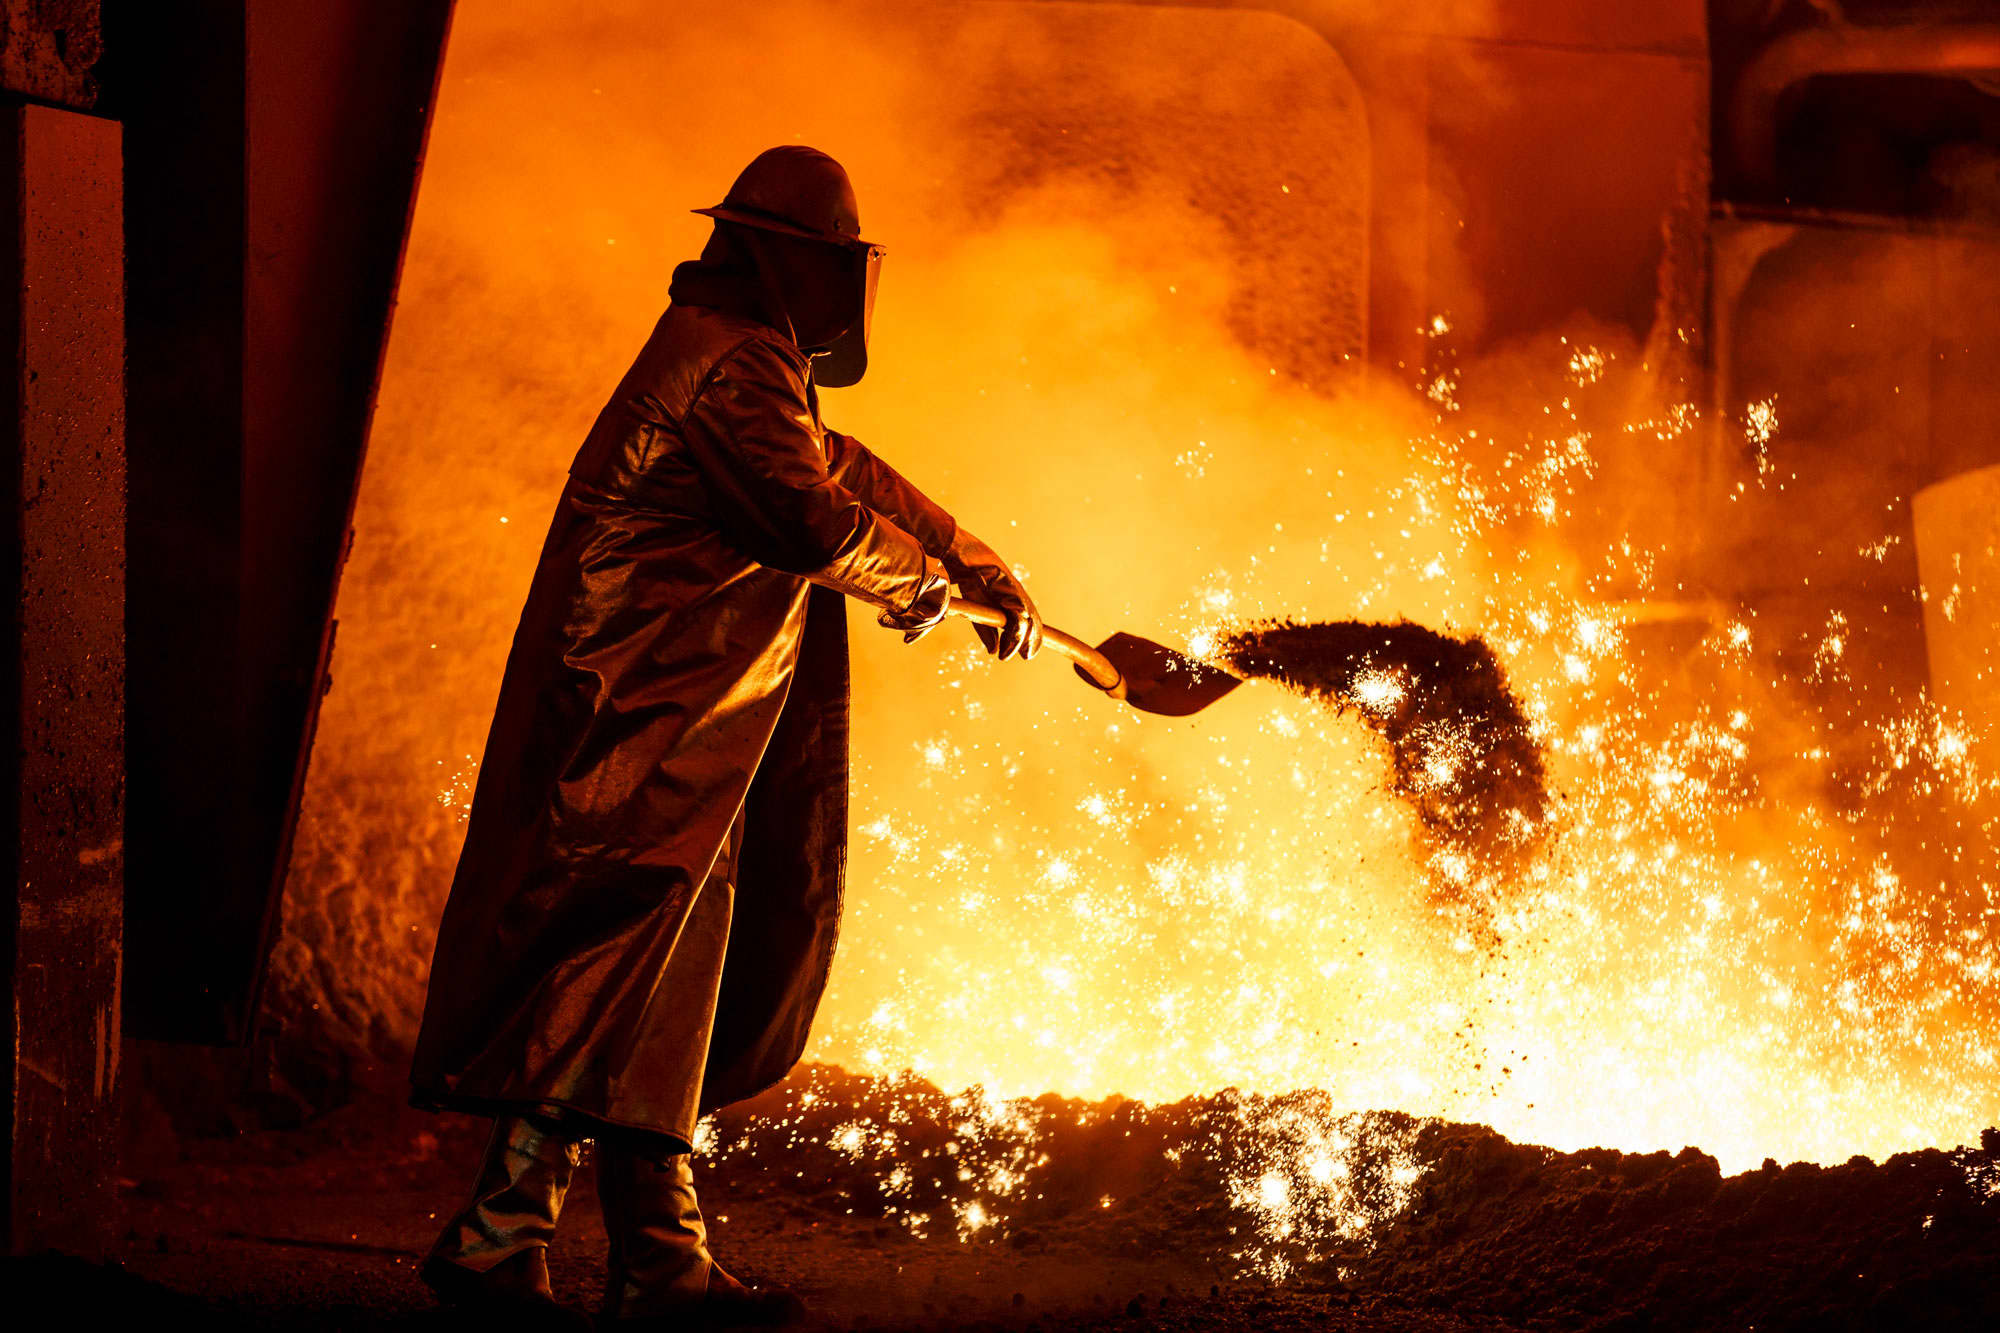 Trump administration will put steel and aluminum tariffs on